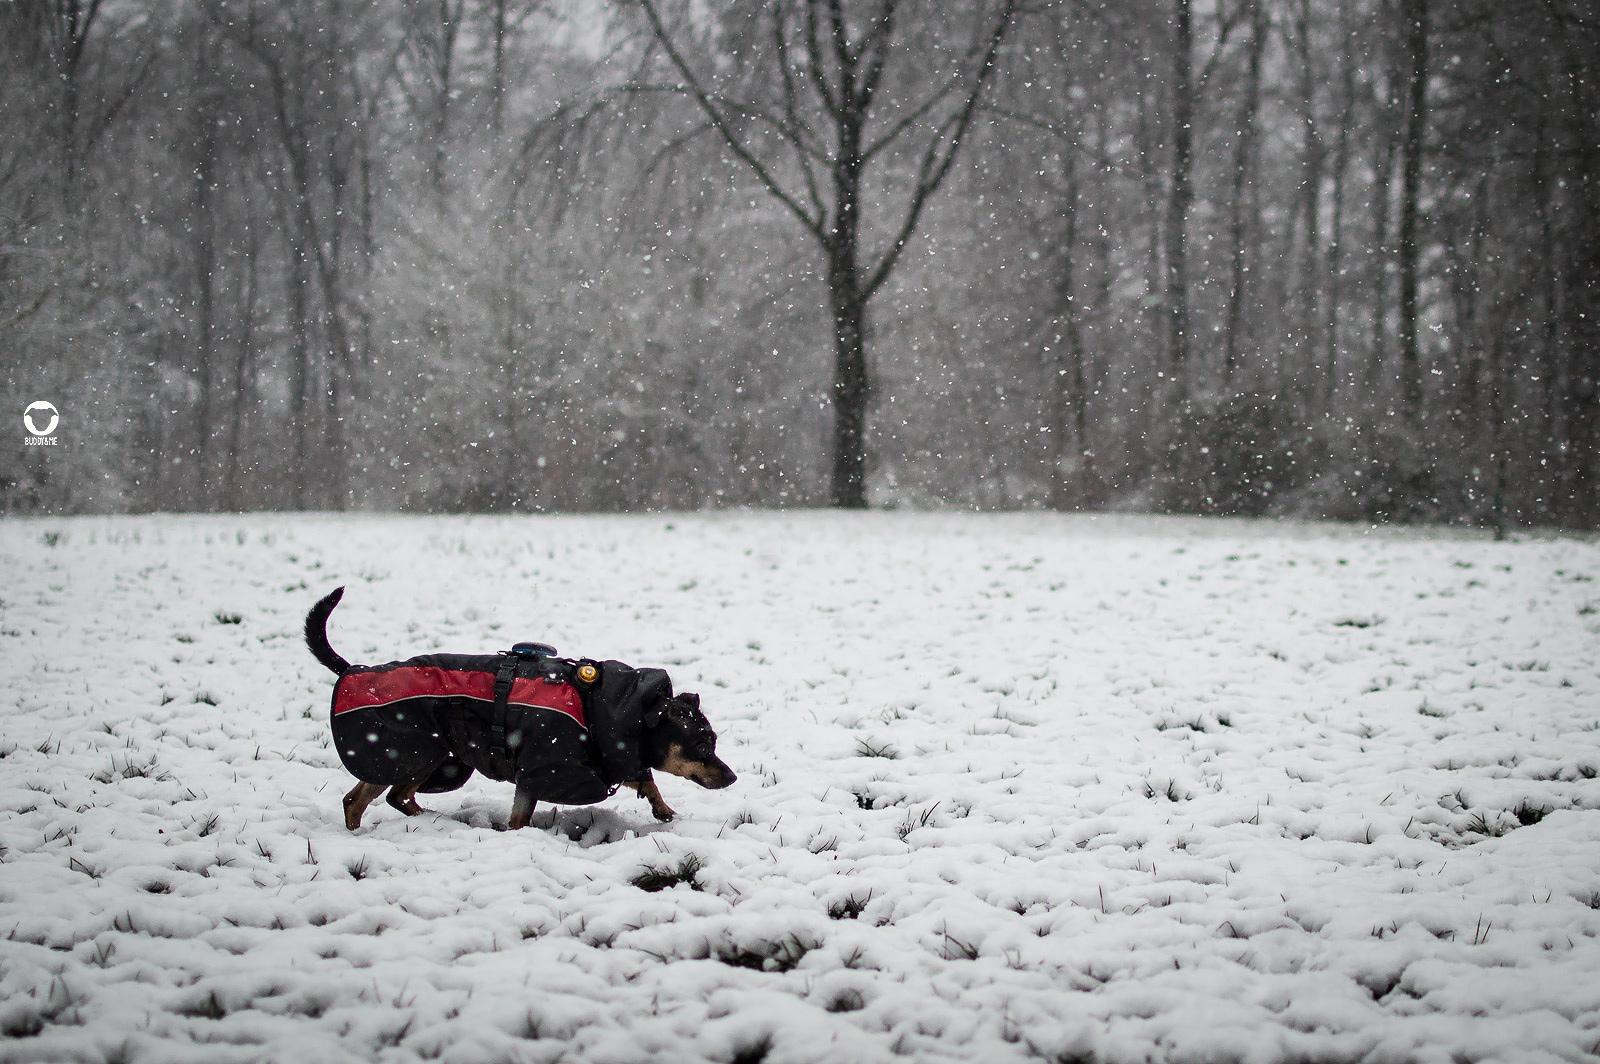 Pinscher Buddy, Buddy and Me, Hundeblog, Dogblog, Ruhrgebiet, Leben mit Hund, Hundealltag, Schnee, Schneetag, Winter, Heissiwald, Hundemantel, Winterwonderland